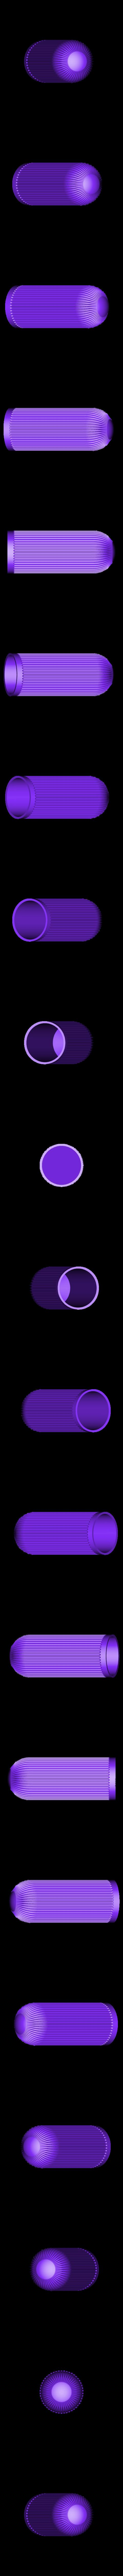 Vase_Tube.stl Download free STL file Gravity - Flower vase • 3D printing object, EUMAKERS